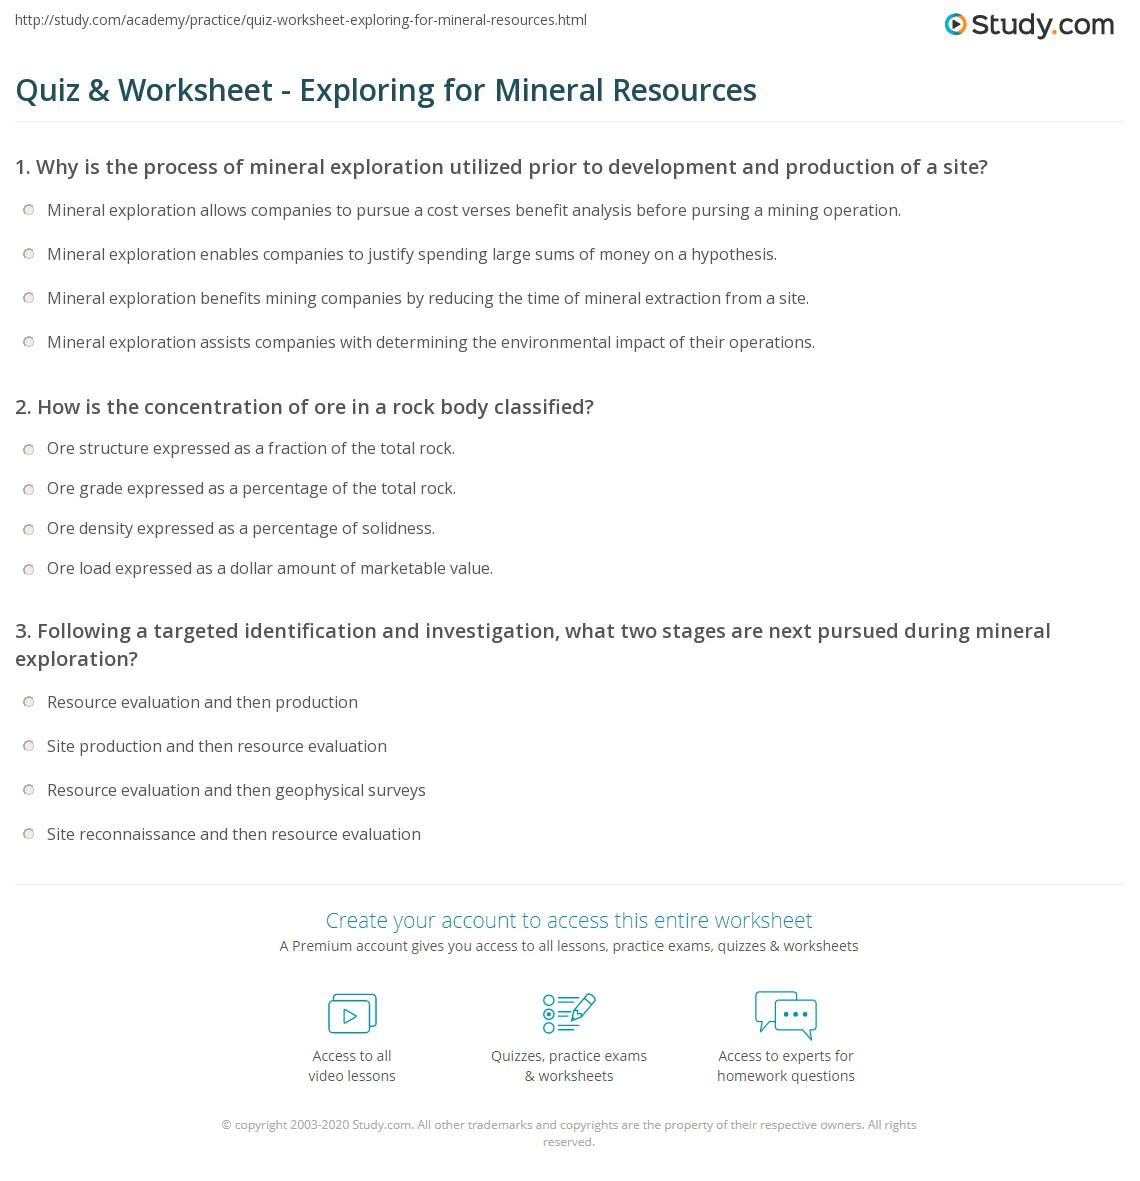 Quiz & Worksheet - Exploring for Mineral Resources | Study com